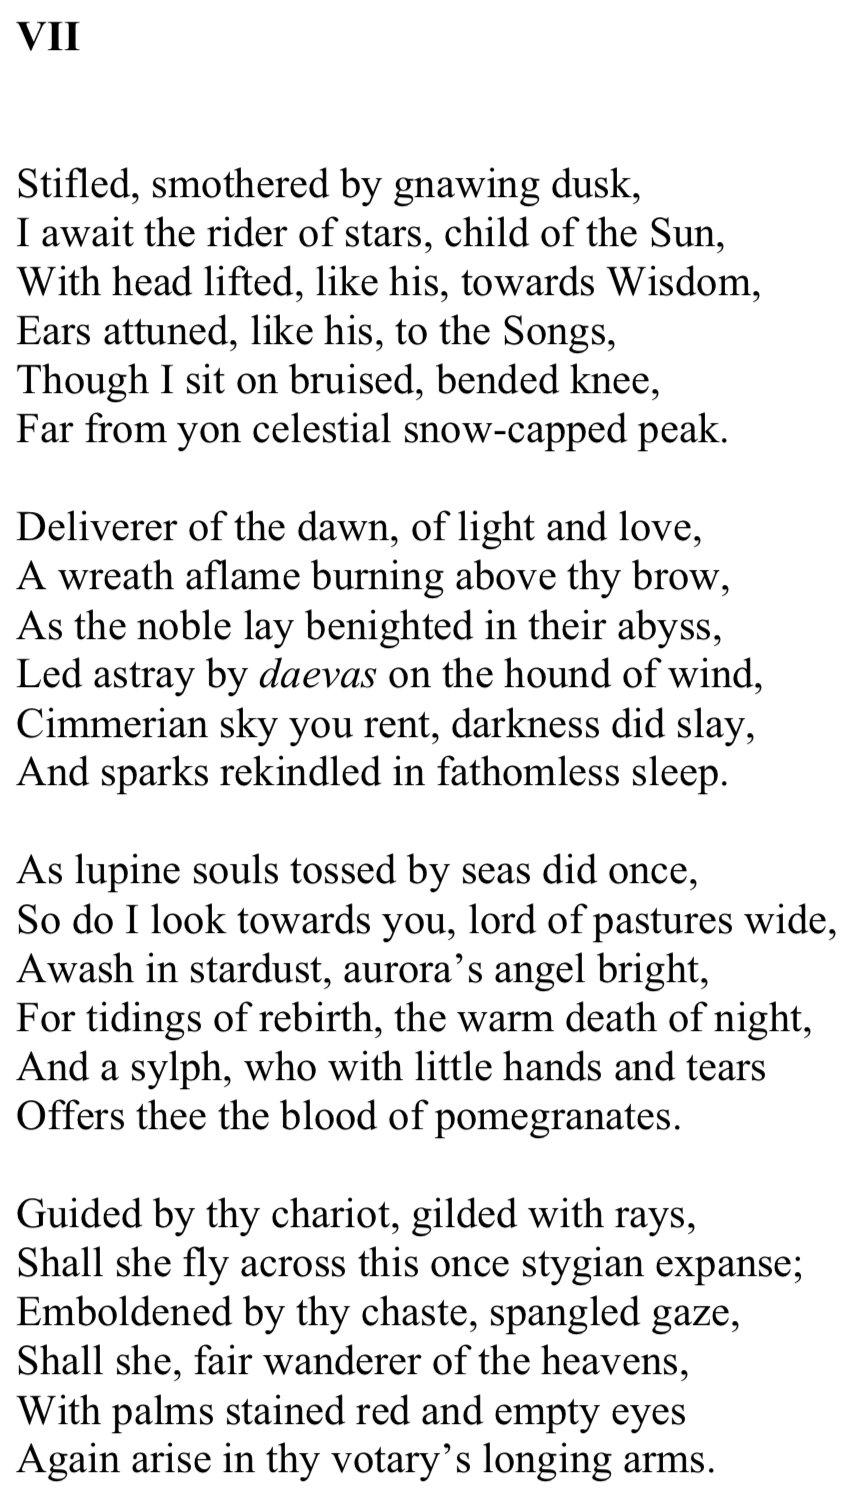 joobin bekhrad on twitter a little poem from my book lovers of